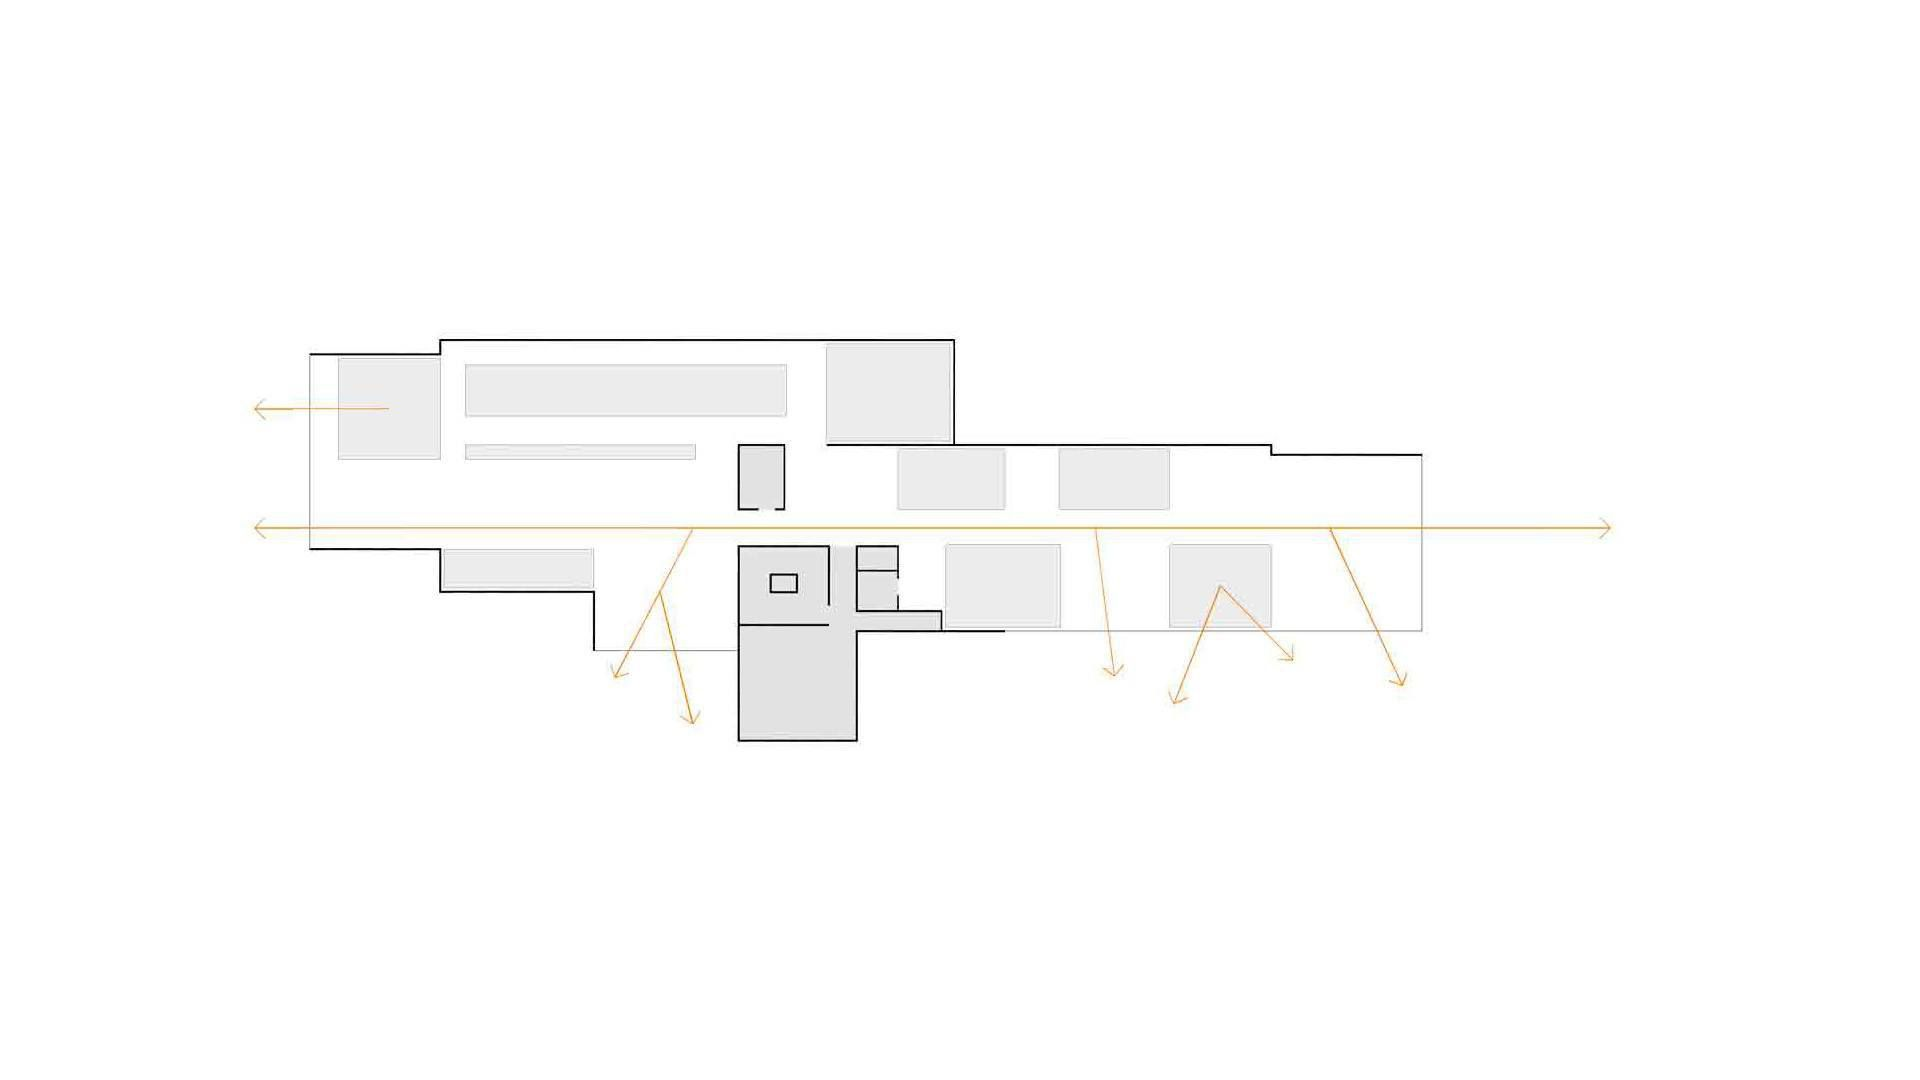 spa-botanique-diagrama-perspectivas-visuais